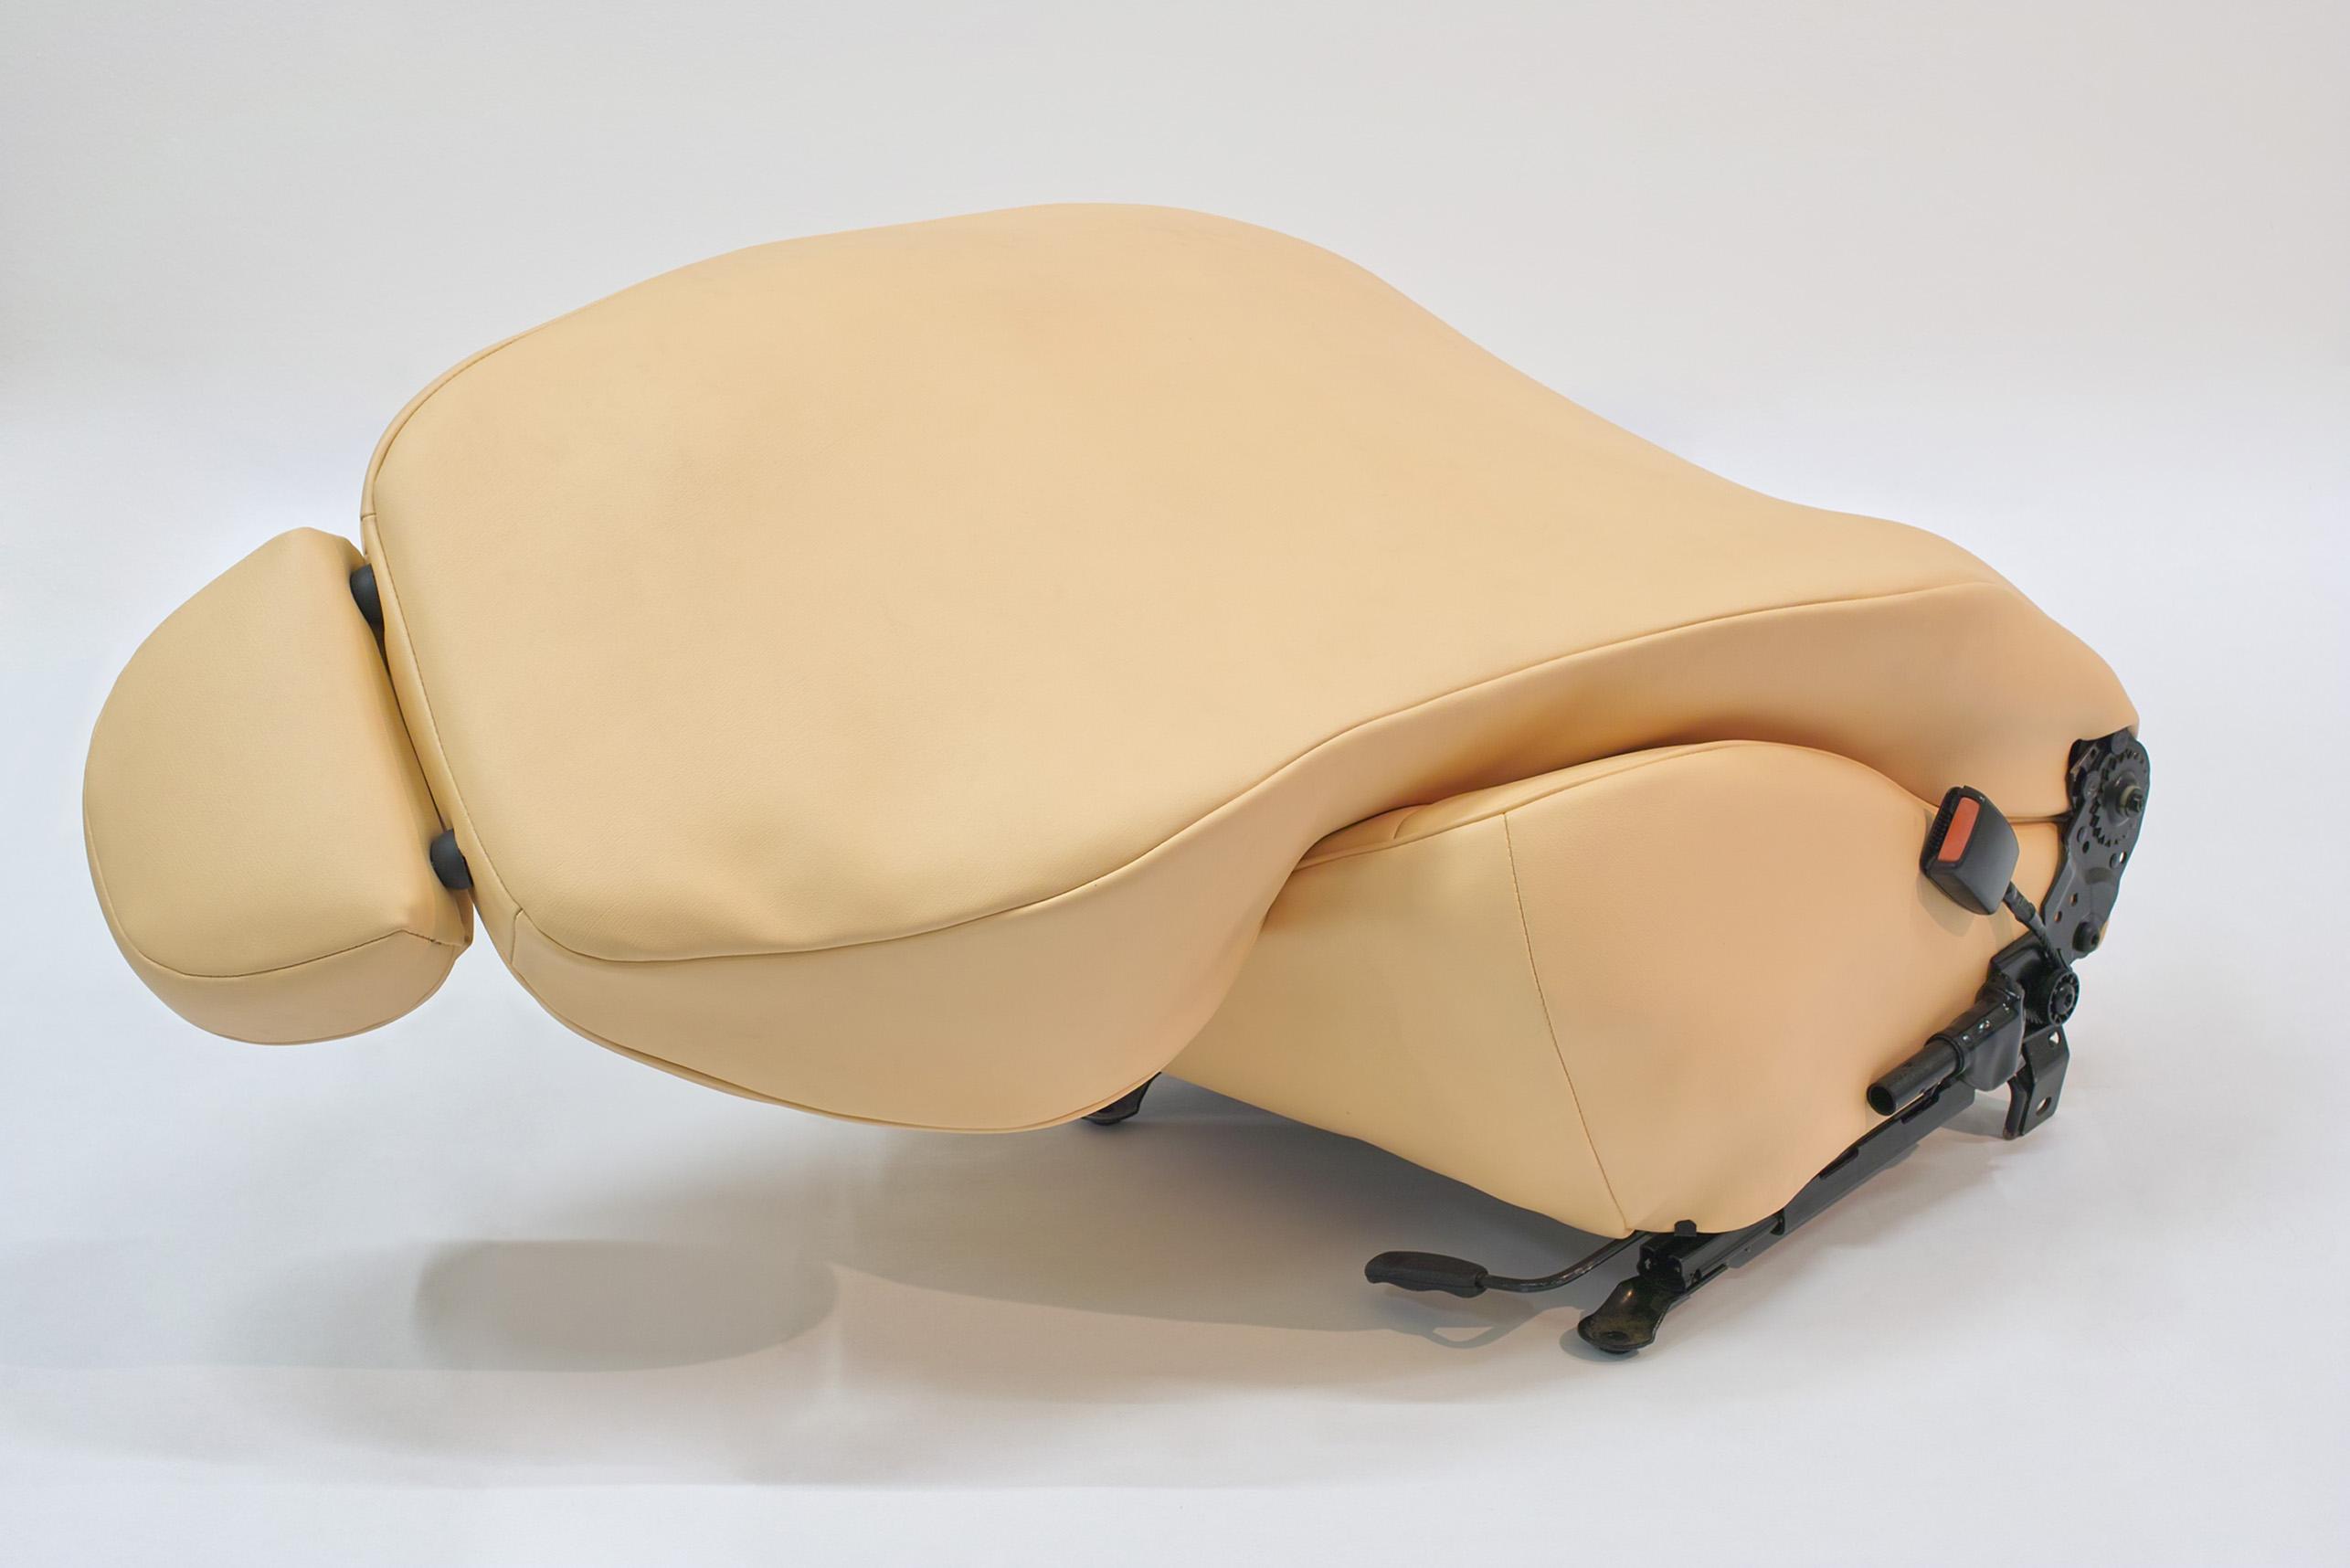 Ewa Axelrad, Warm Leatherette 2012, tapicerka, stal, gąbka, 120x60x60 cm